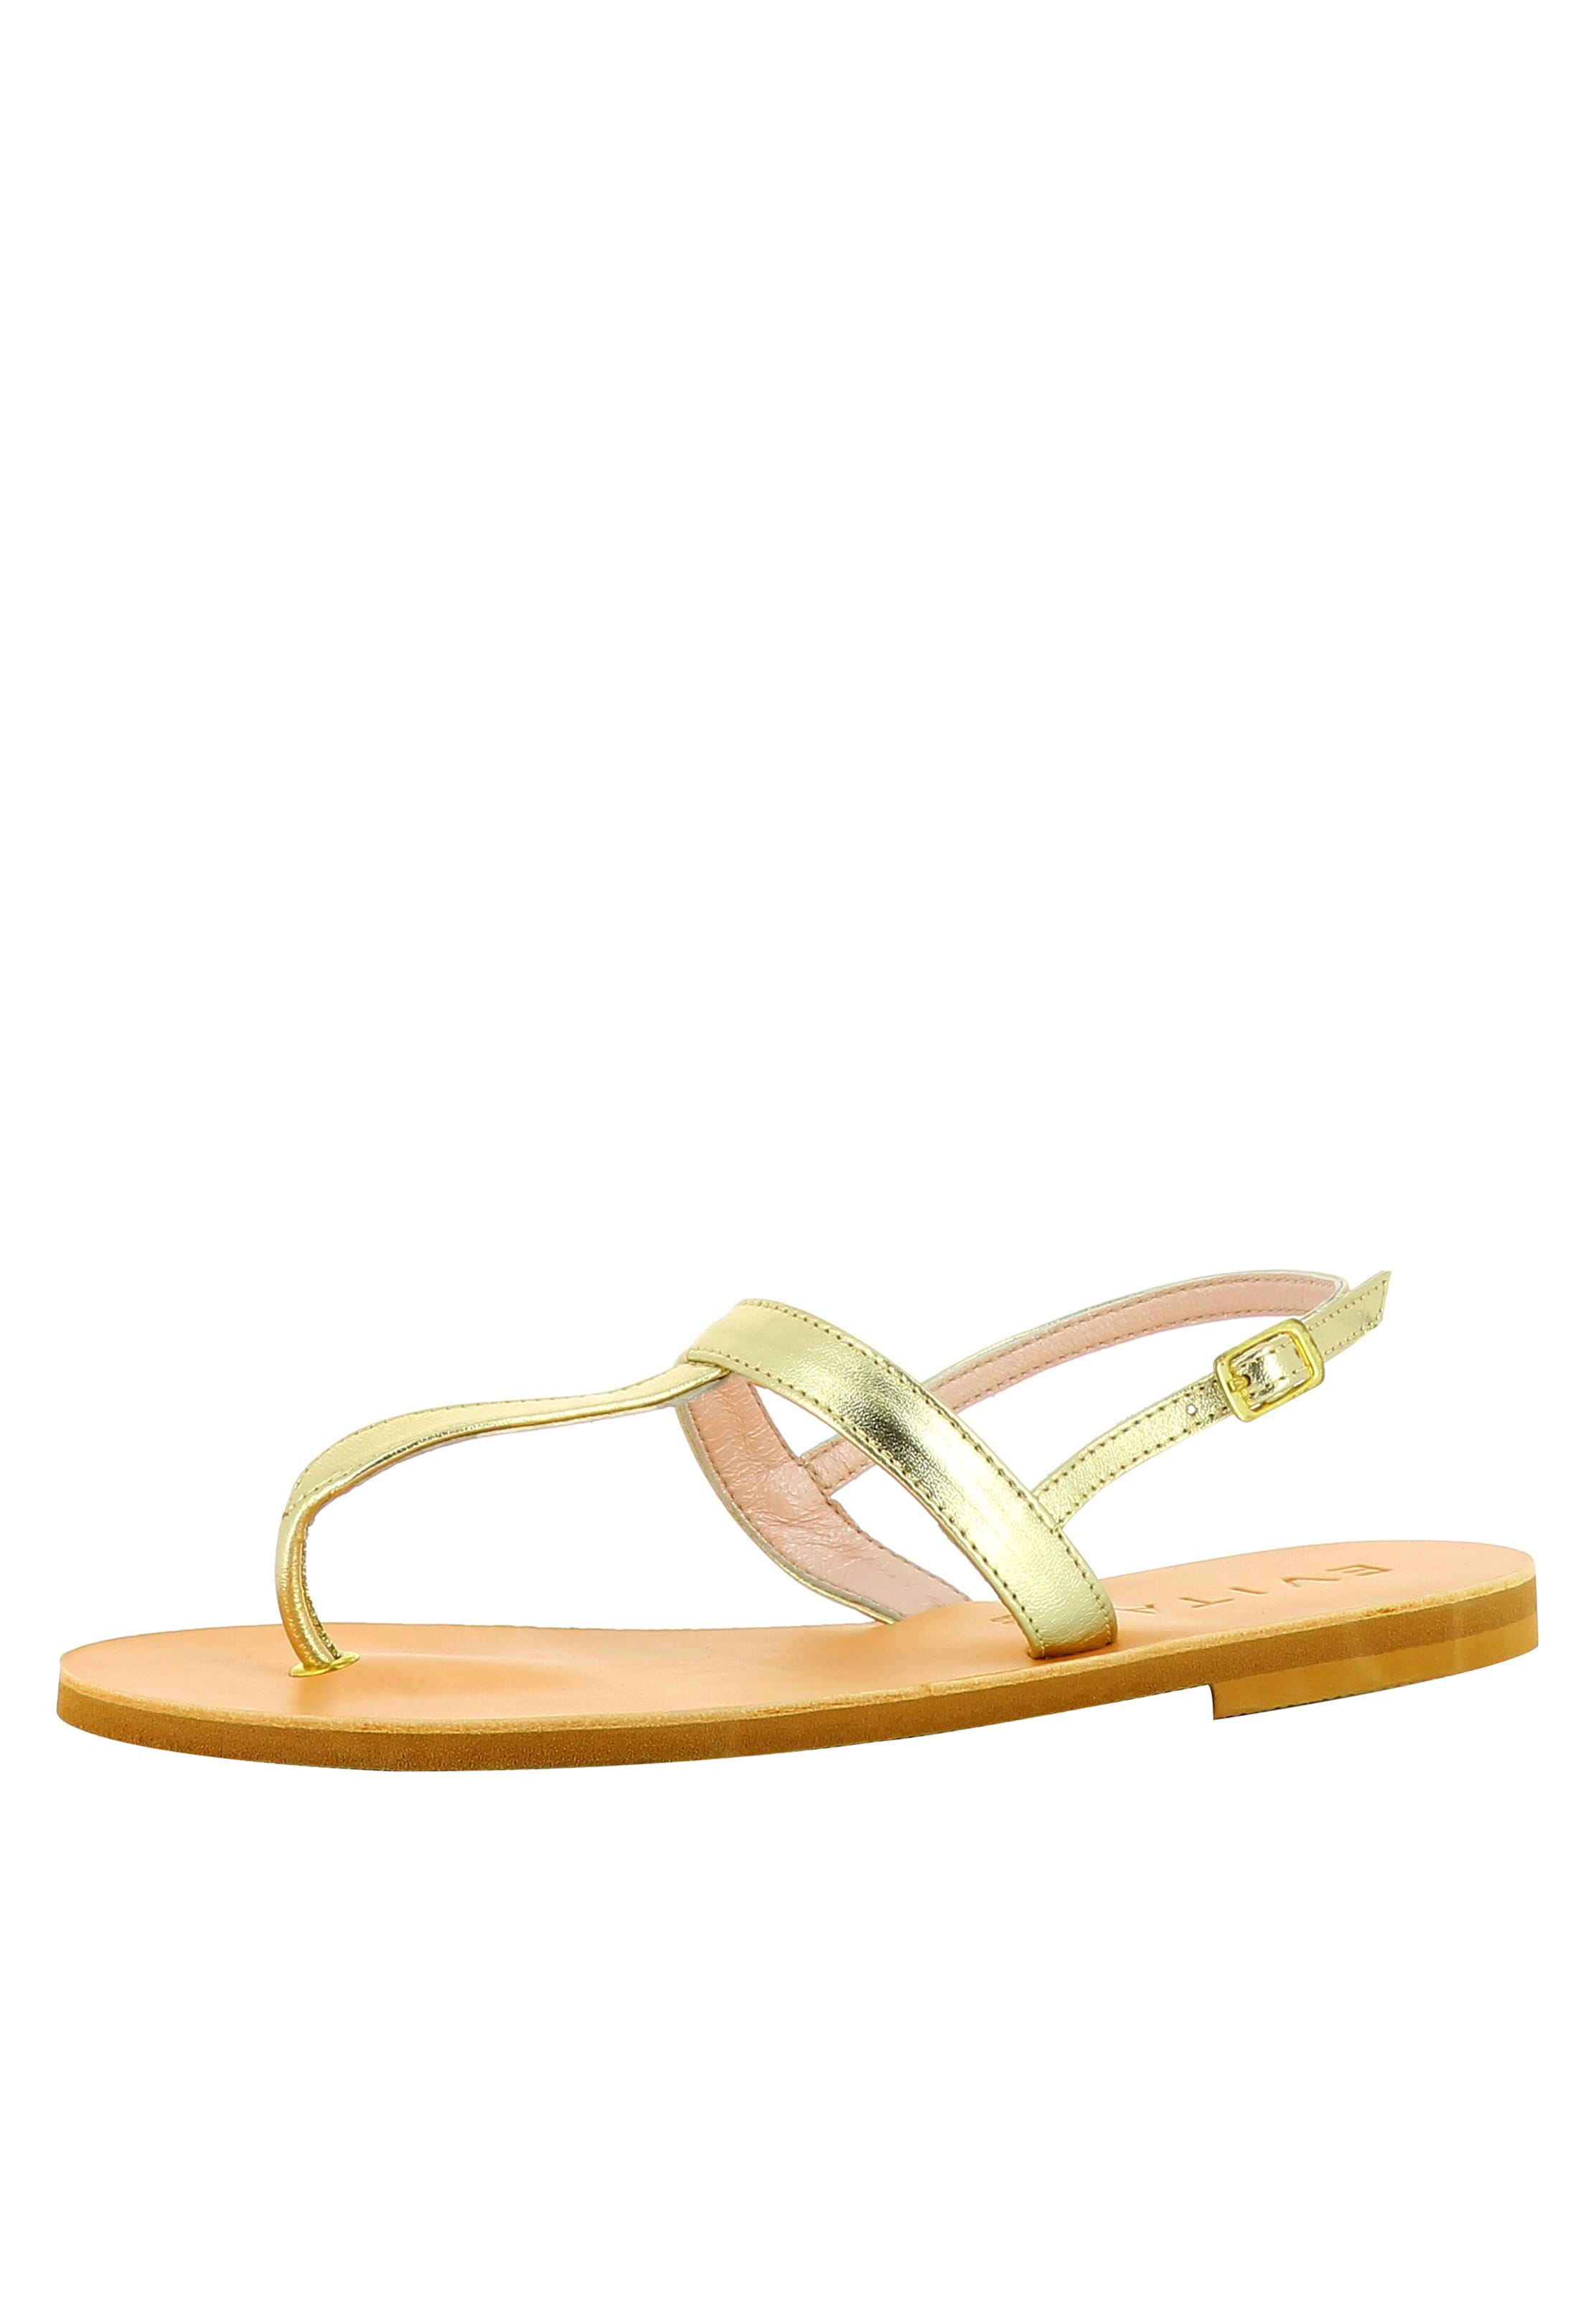 Haltbare Mode billige Schuhe EVITA | Damen Sandale Schuhe Gut getragene Schuhe